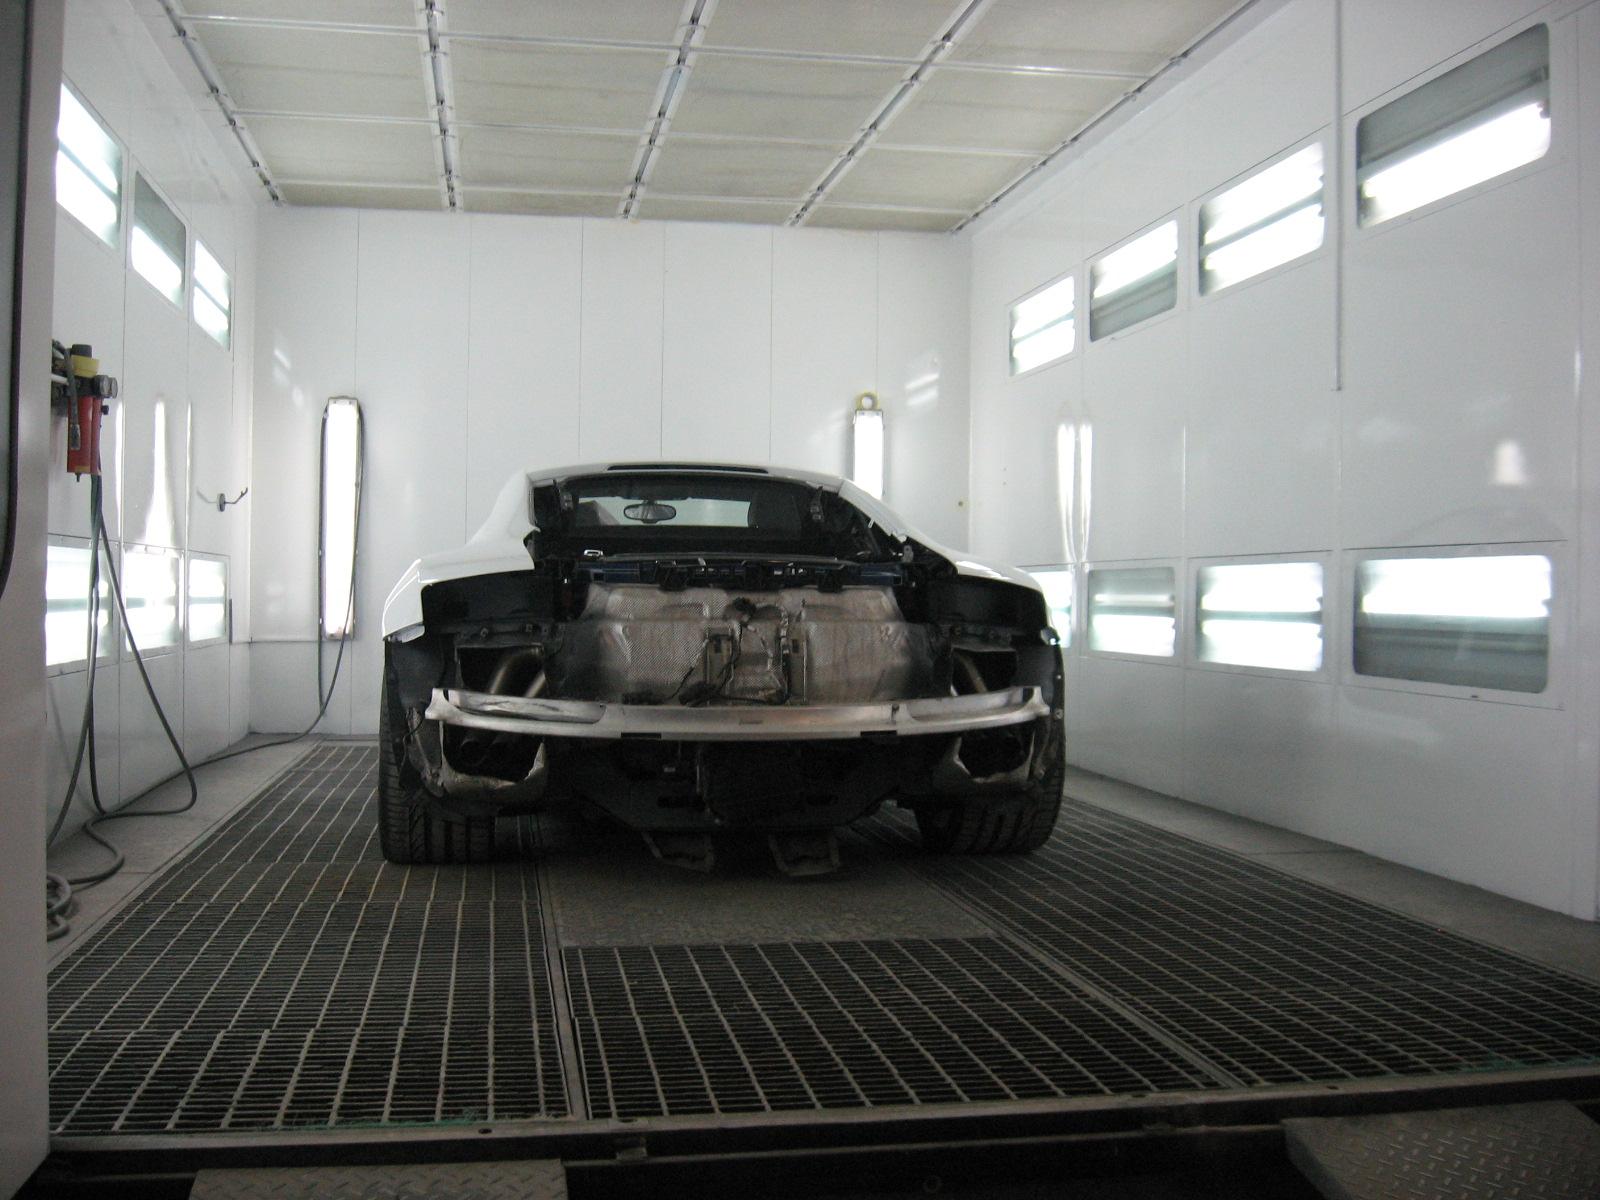 auto peintre fabulous carrosserie peinture remiremont with auto peintre atelier carrosserie. Black Bedroom Furniture Sets. Home Design Ideas